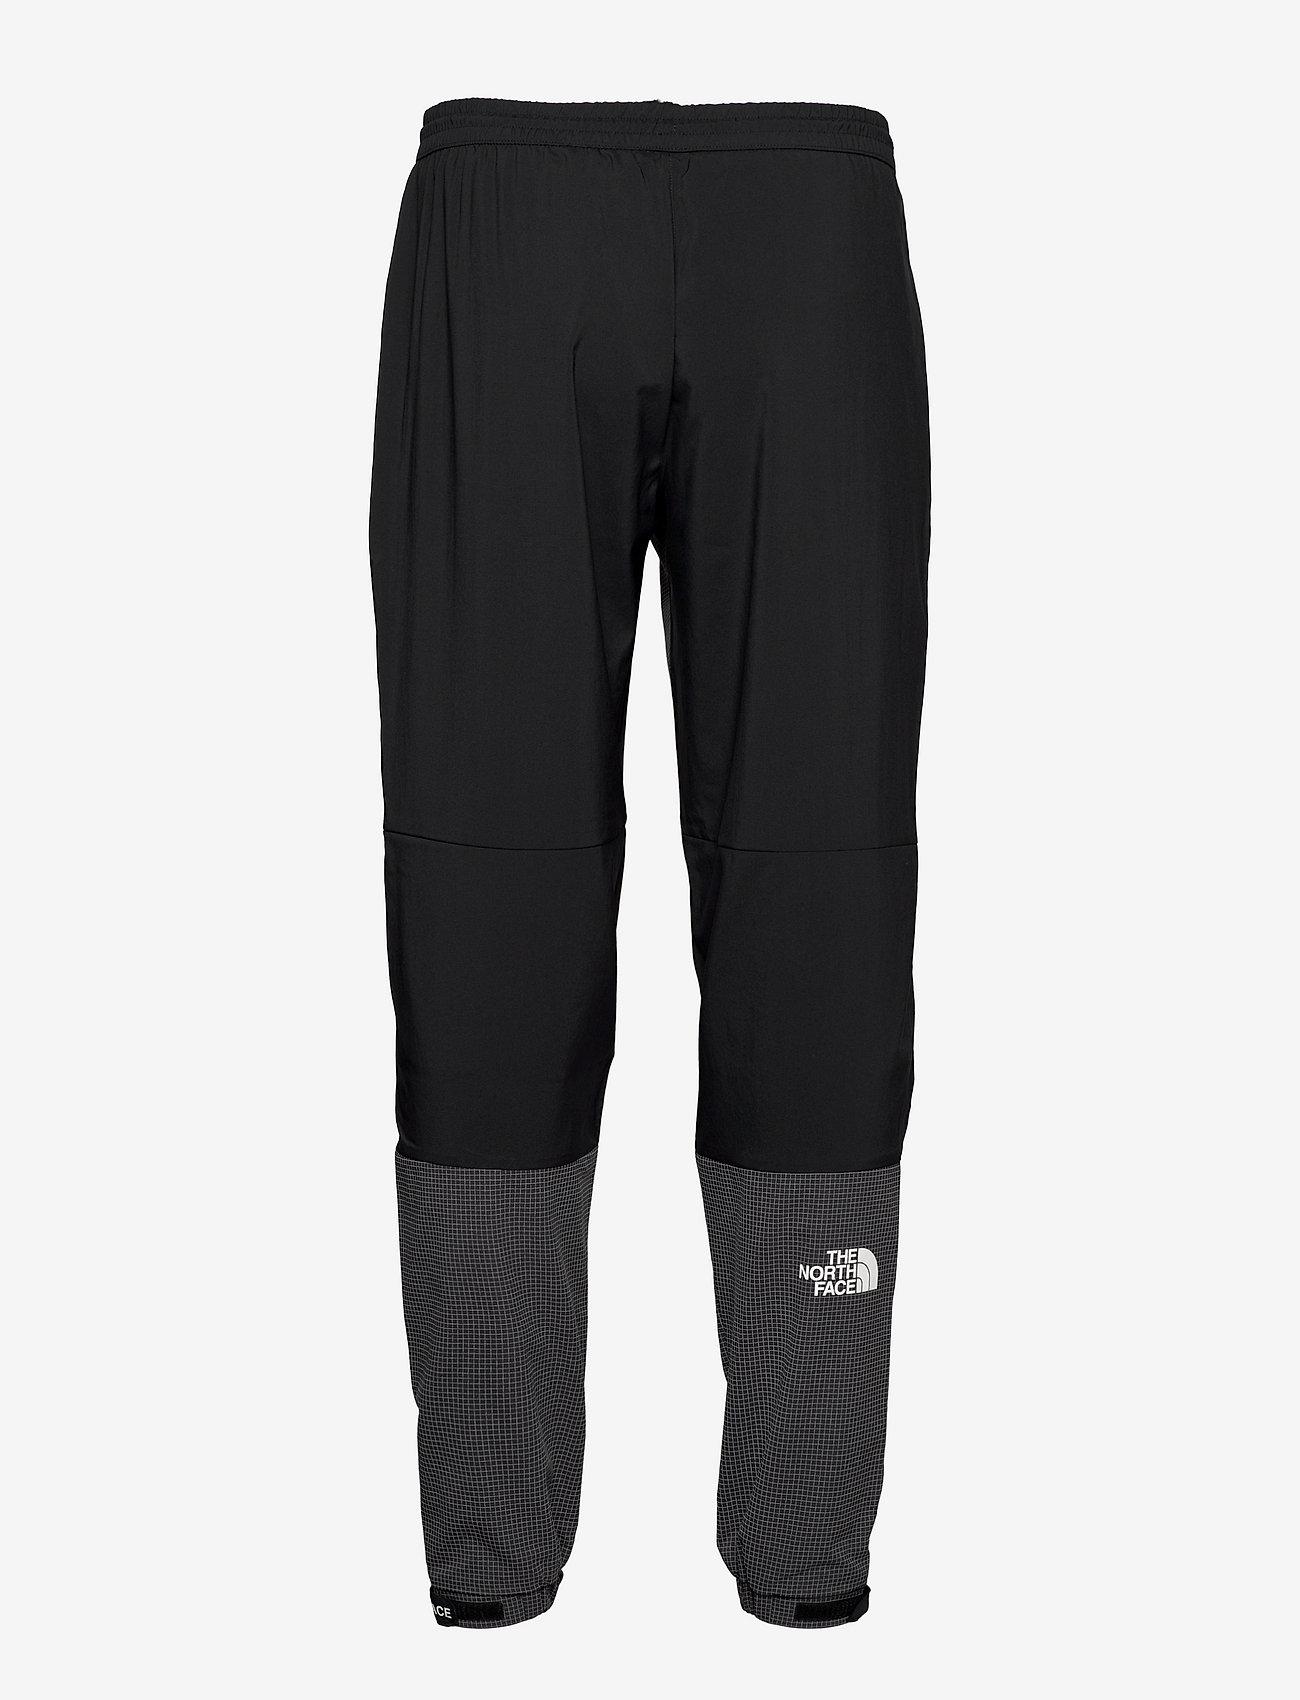 The North Face - M MA WOVEN PANT - EU - pantalon de randonnée - tnf black - 1